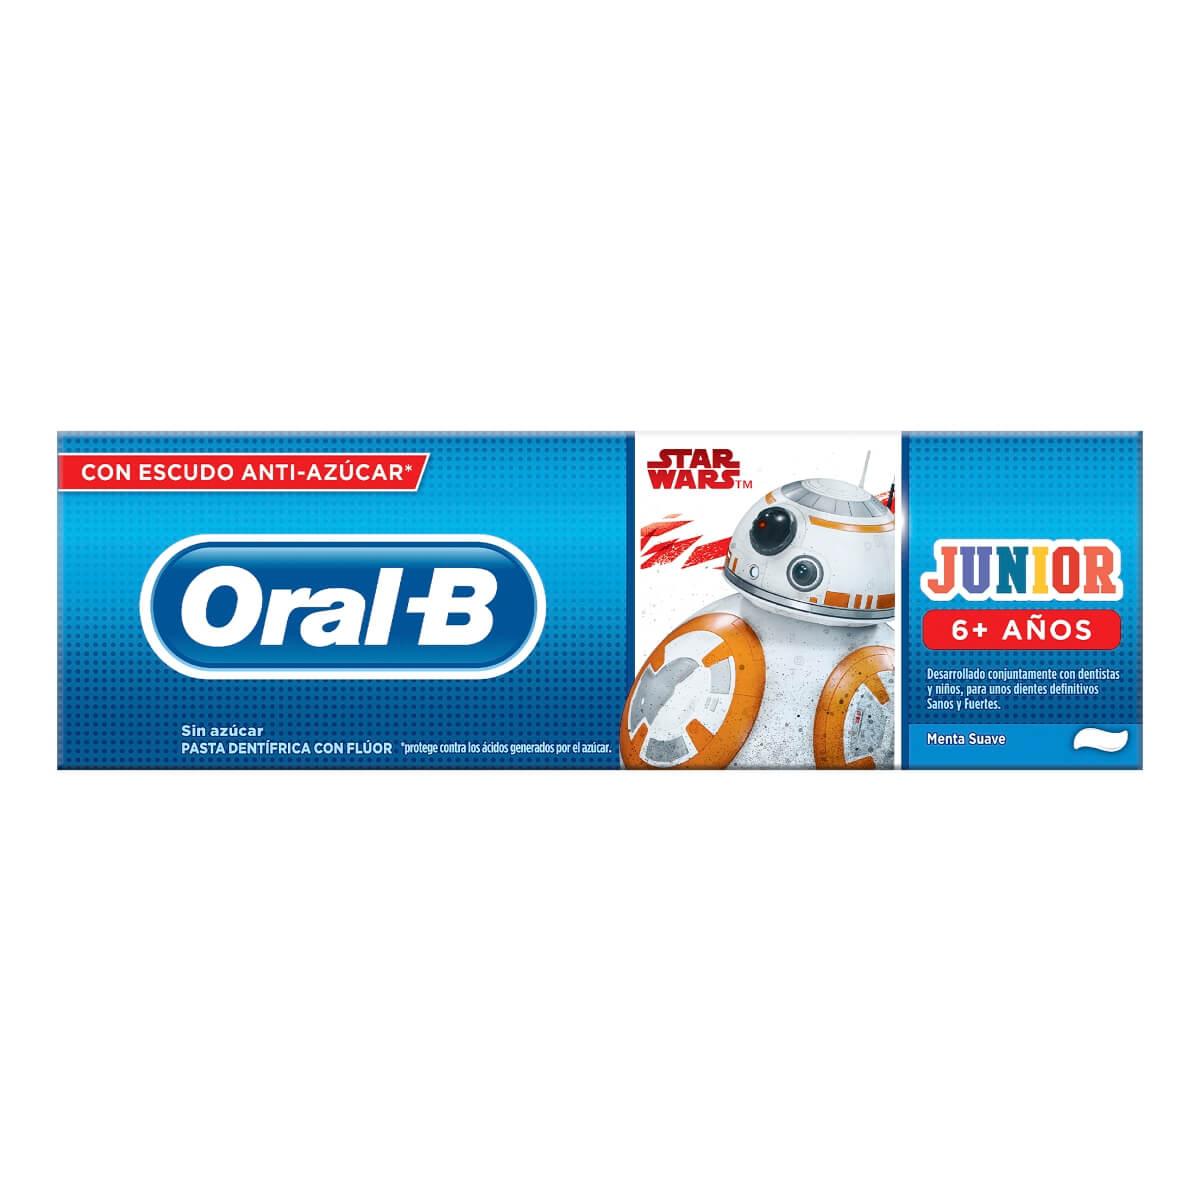 Oral-B Pasta Star Wars junior 75ml